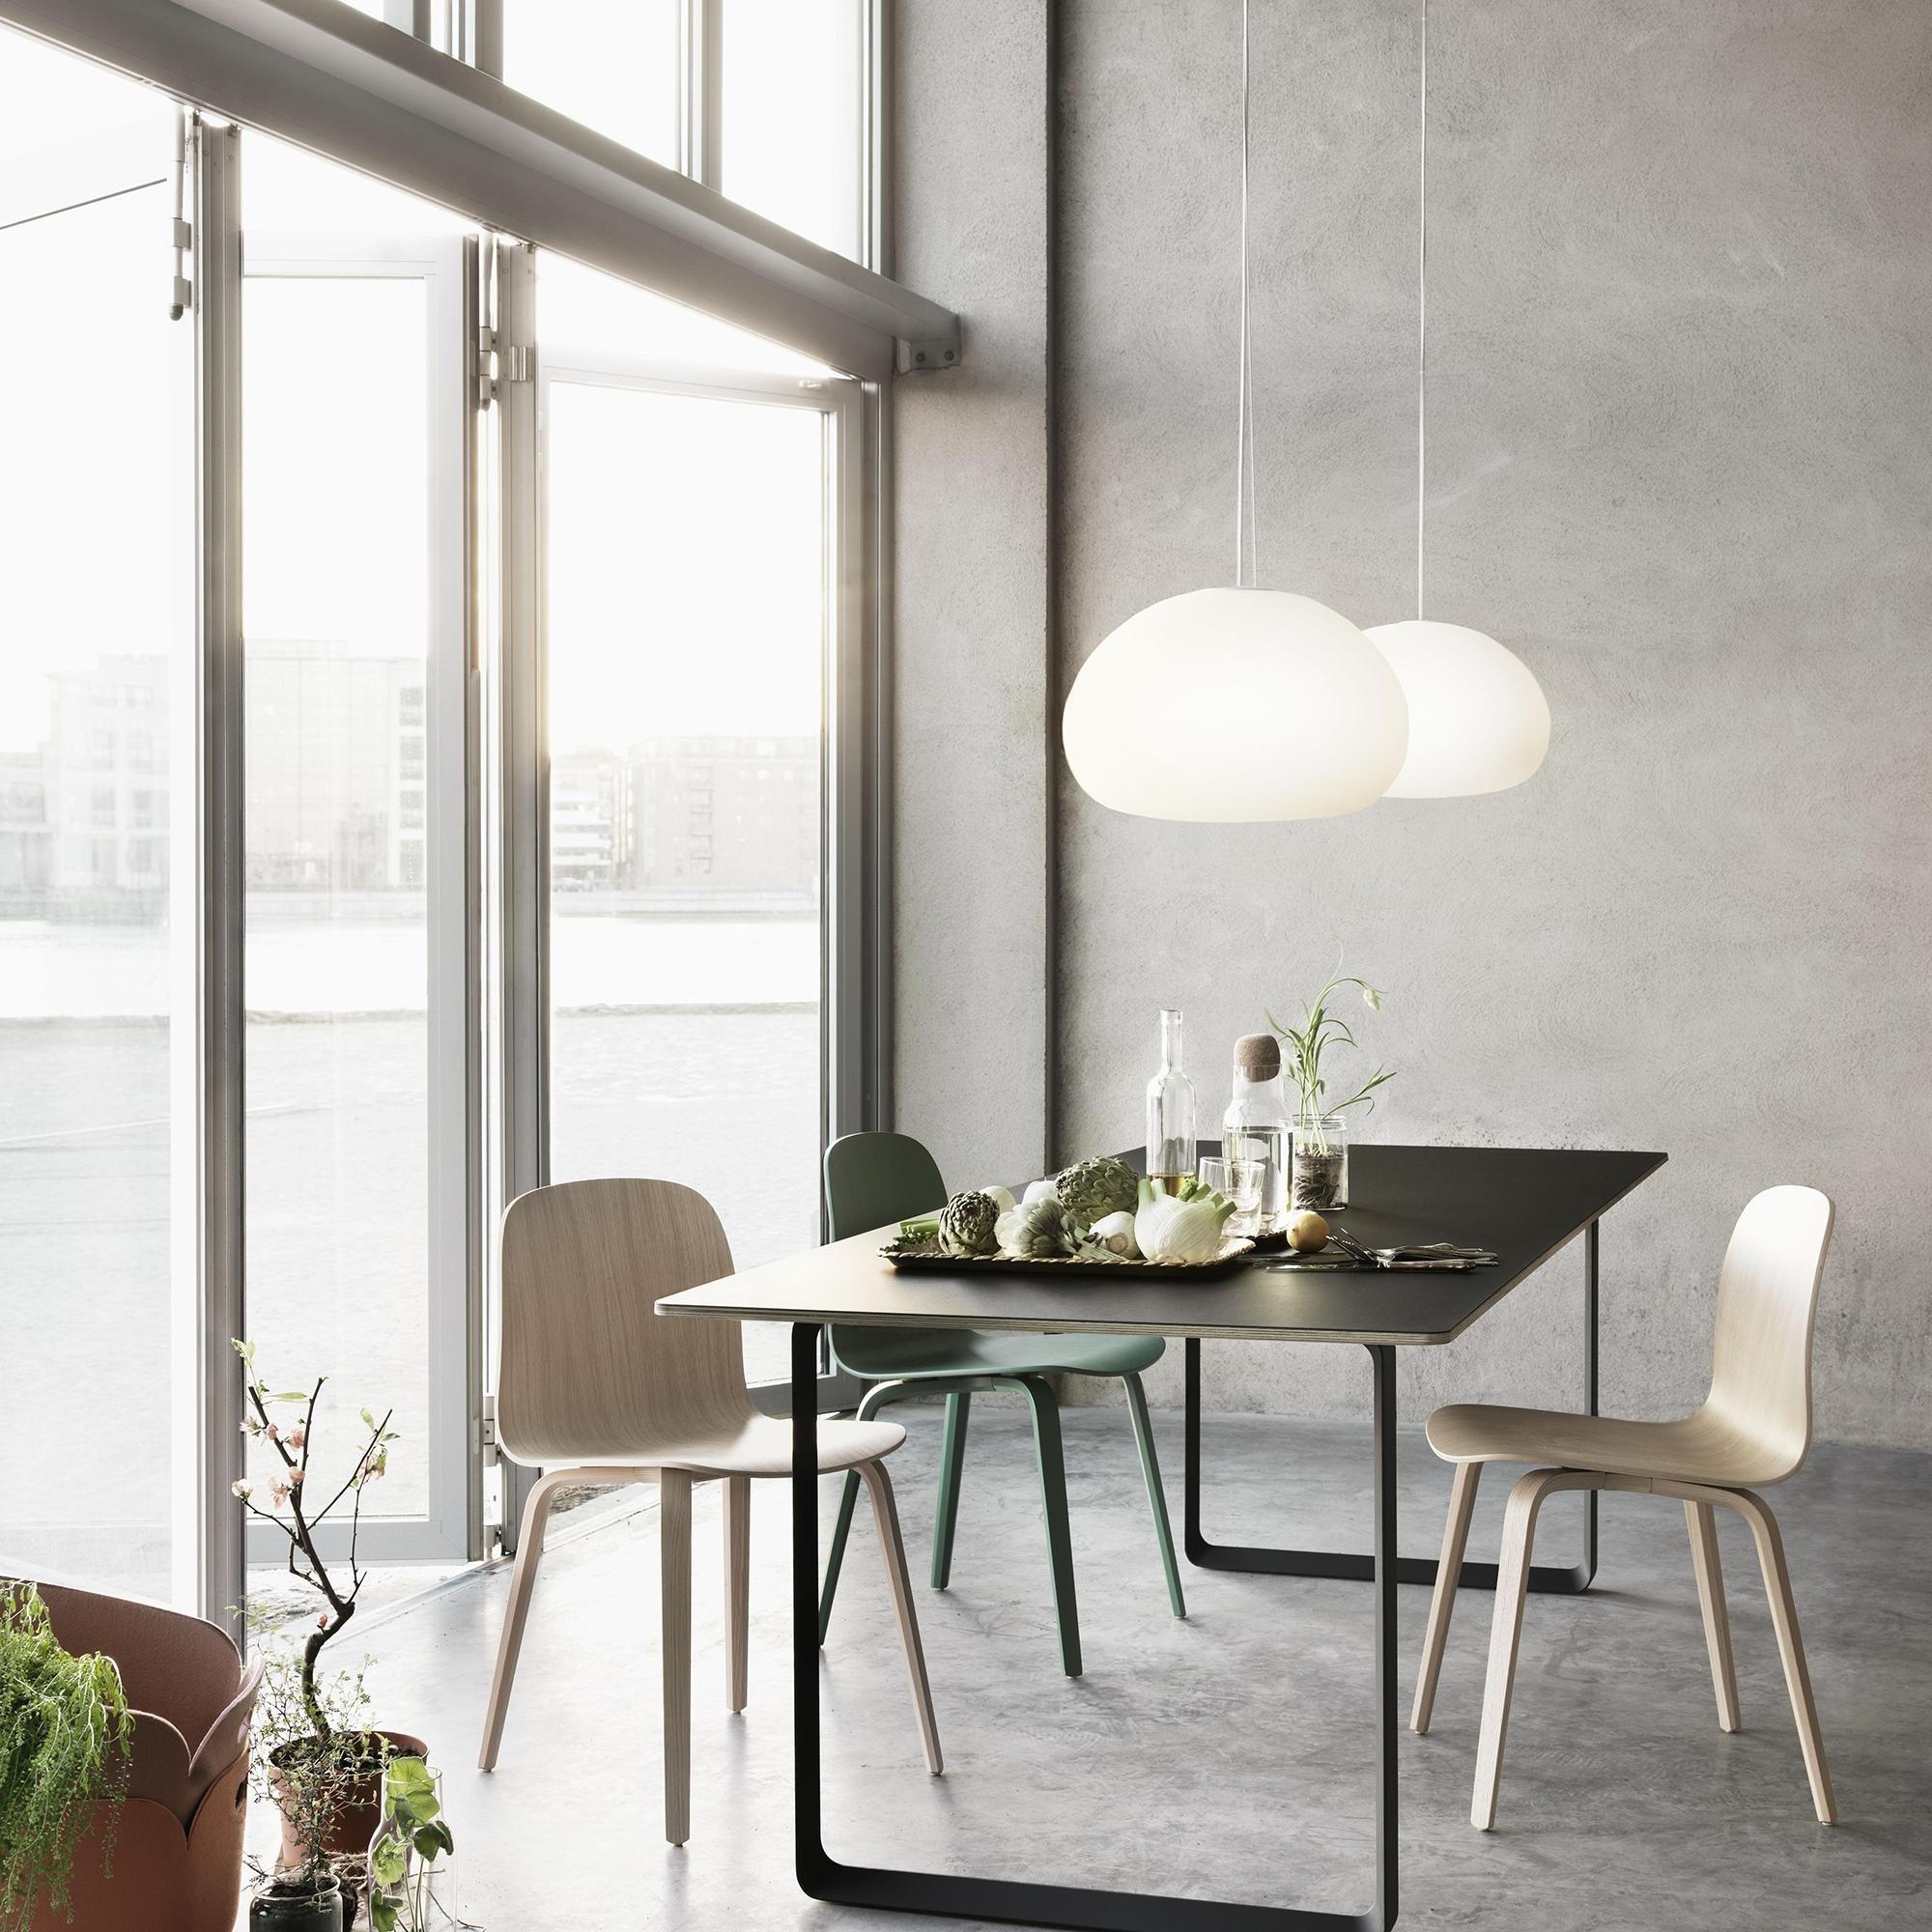 Muuto Visu Chair With Wood Frame